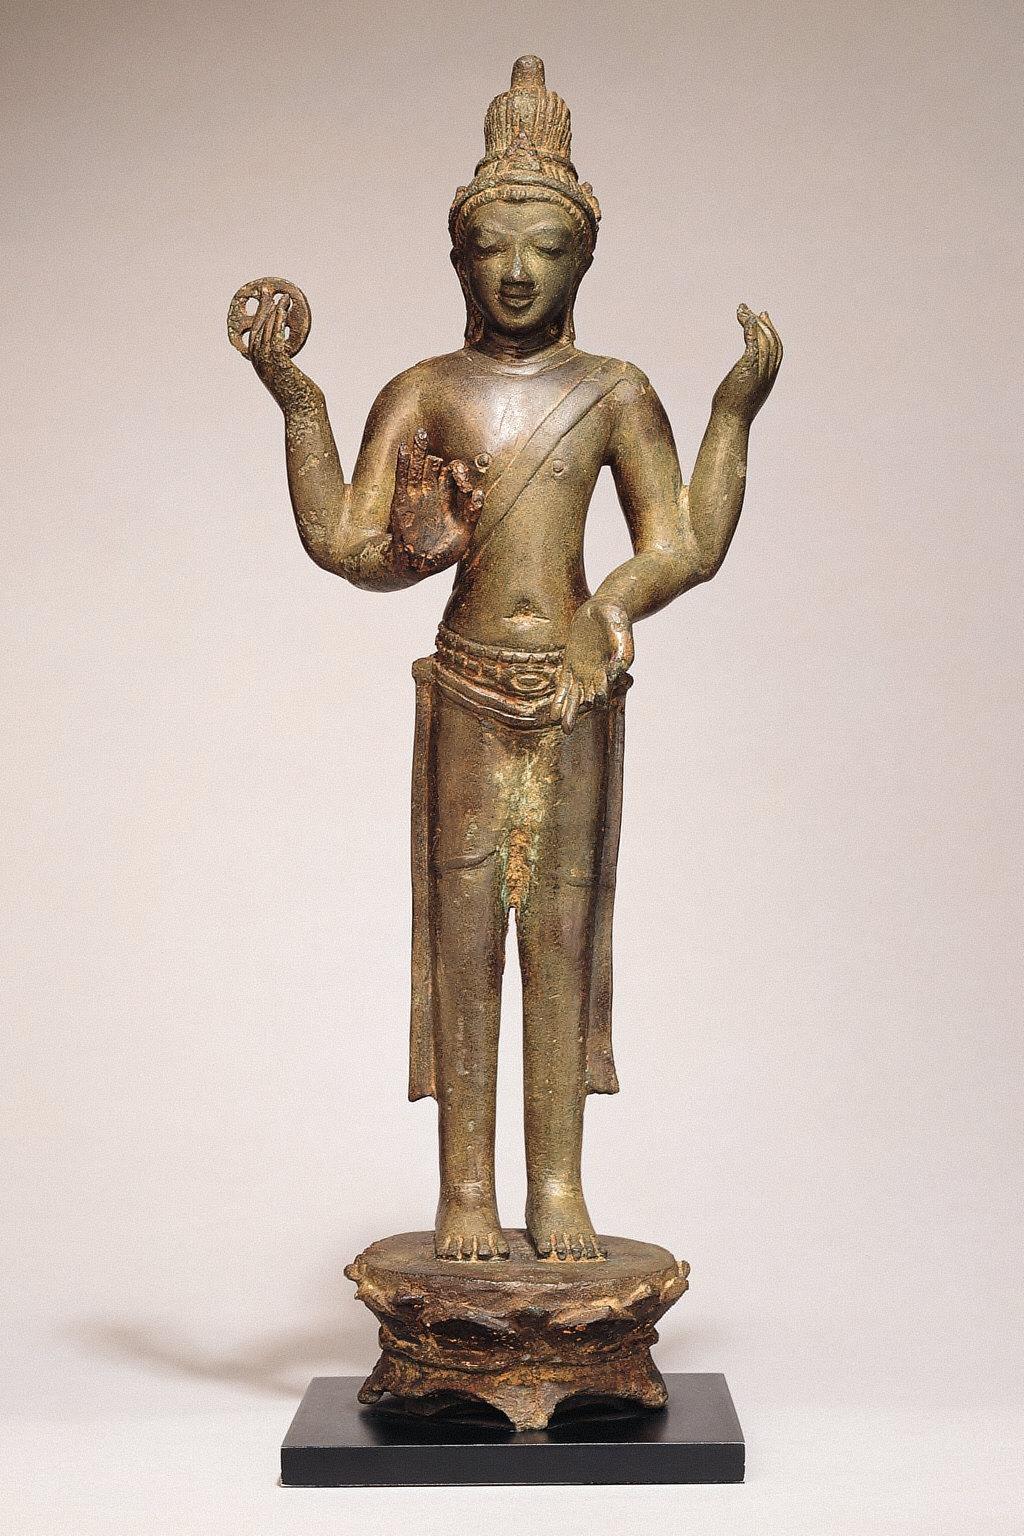 Standing Figure, Probably a Bodhisattva